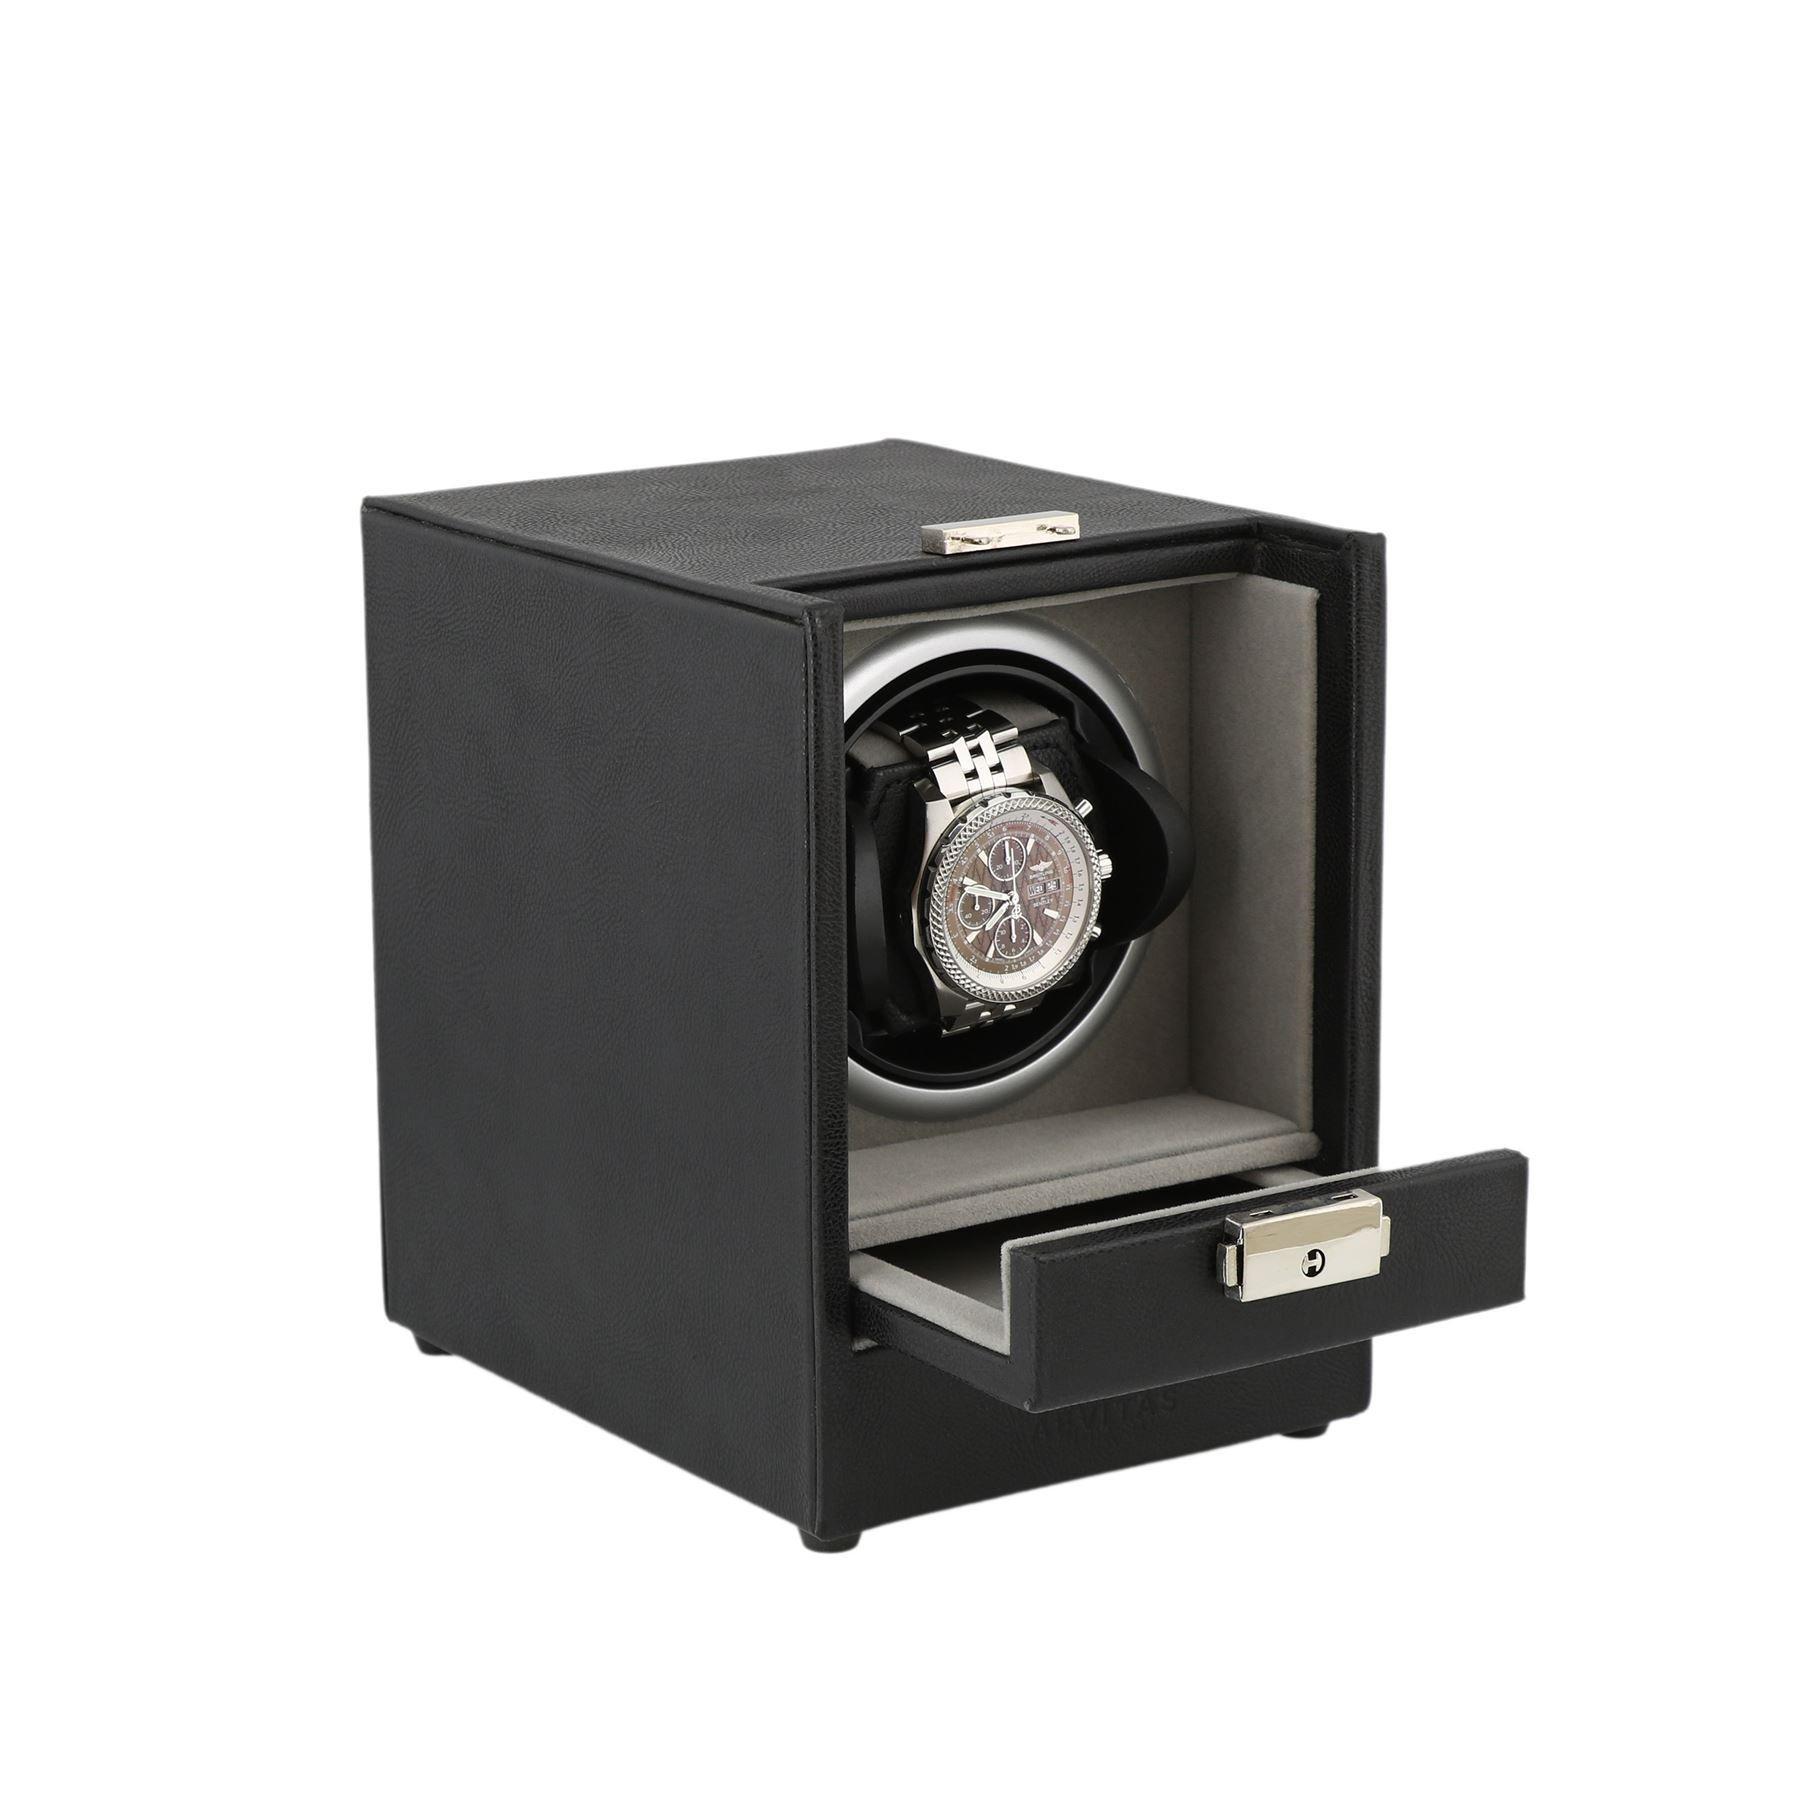 Black Genuine Leather Watch Winder - Slide Away Door - Platinum Velvet Lining by Aevitas